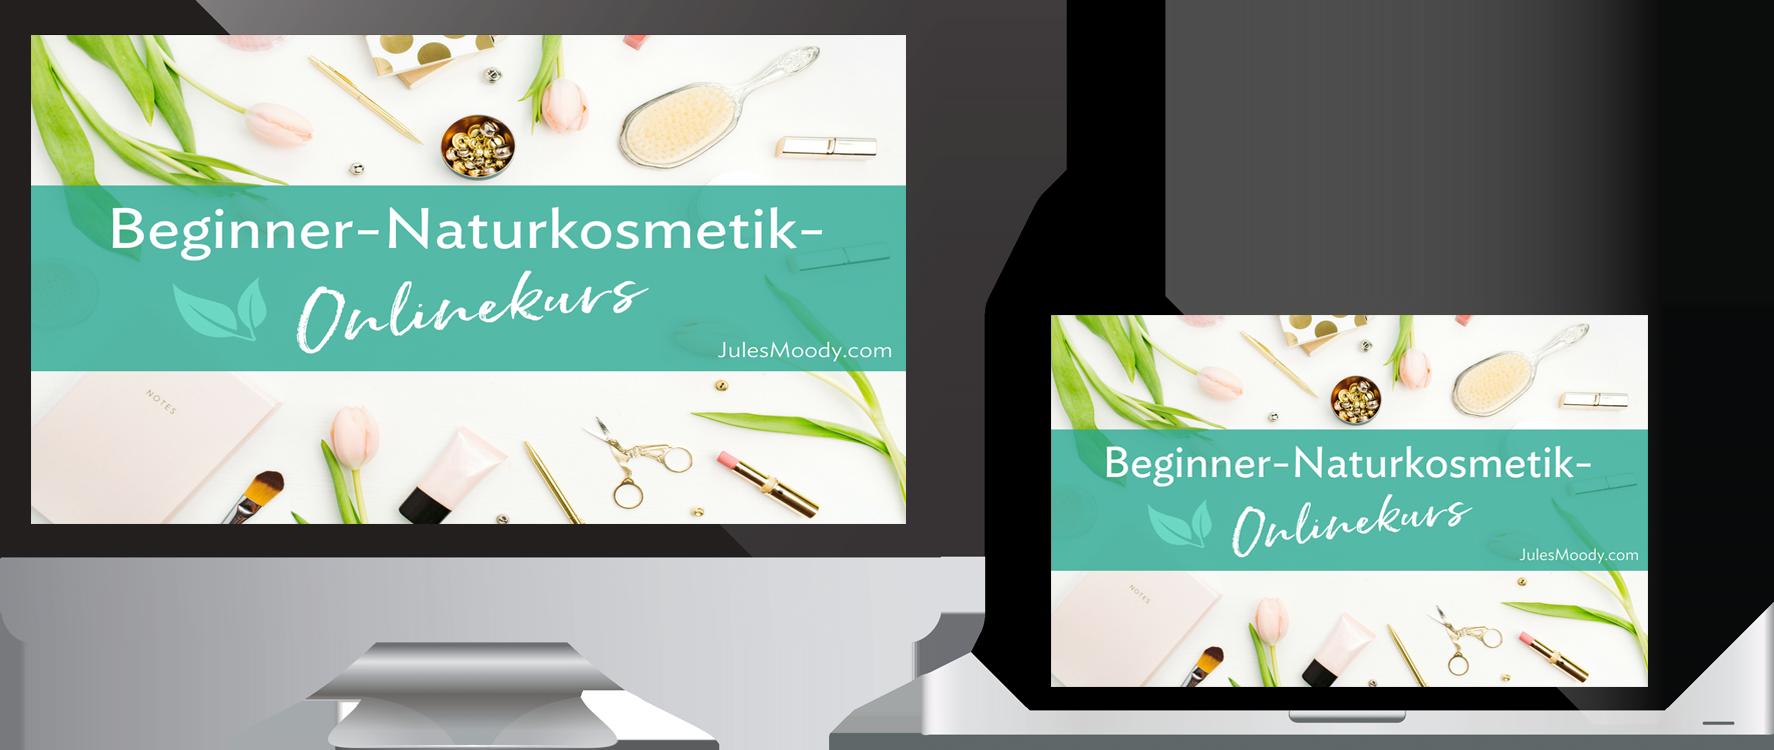 Beginner Naturkosmetik Onlinekurs